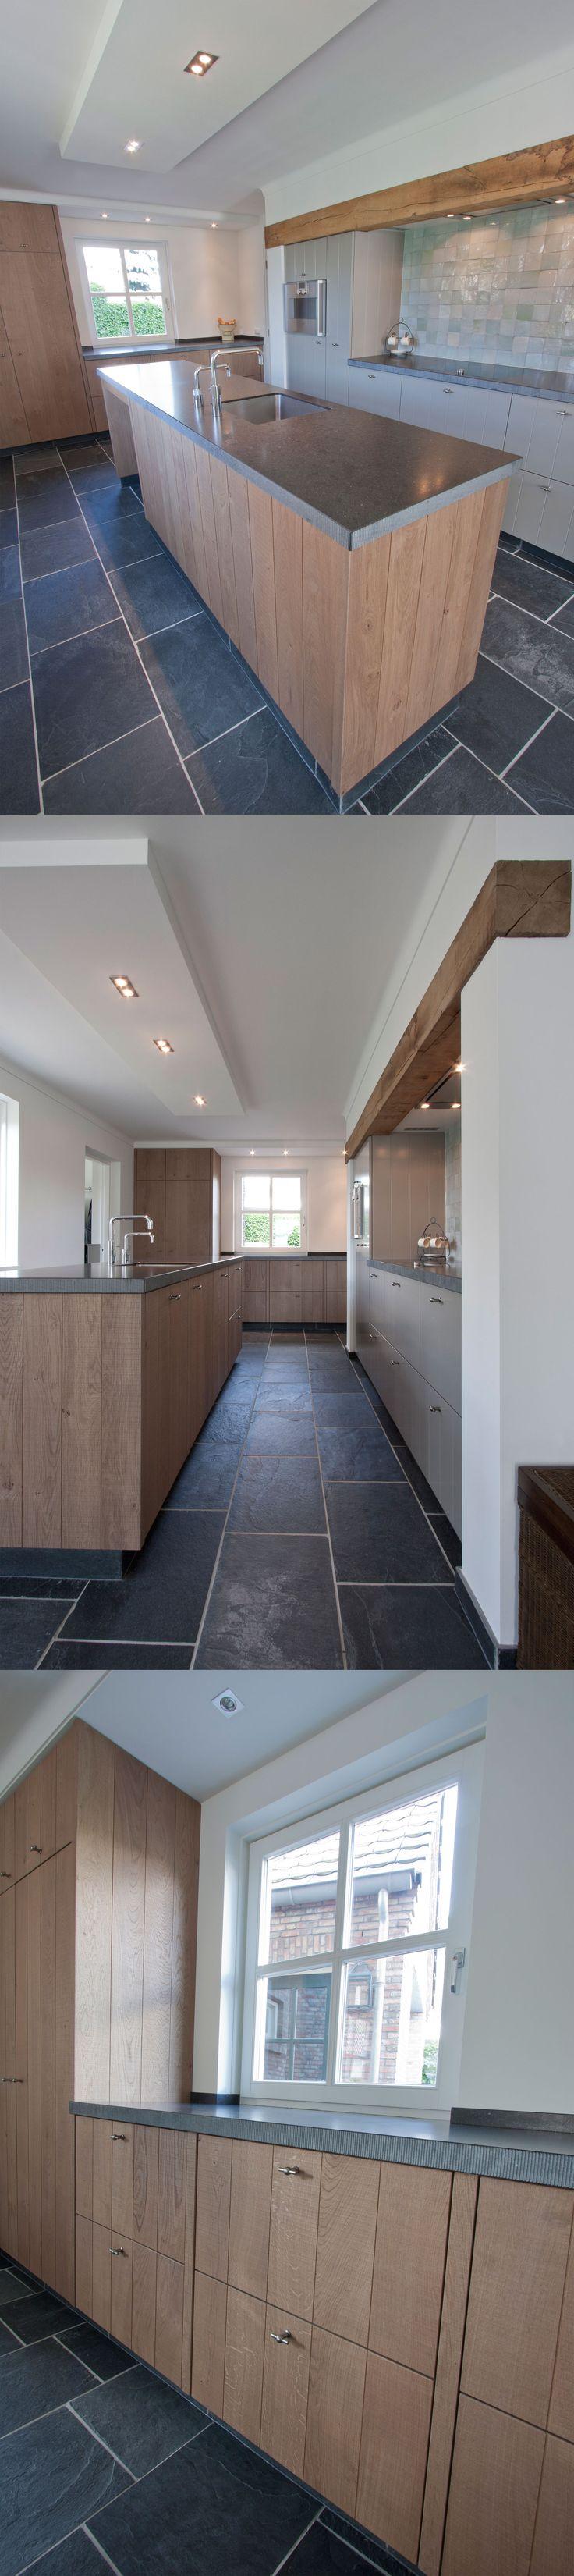 Corné Interieurs - Landelijke Keuken #eiken #EMERYetCIE